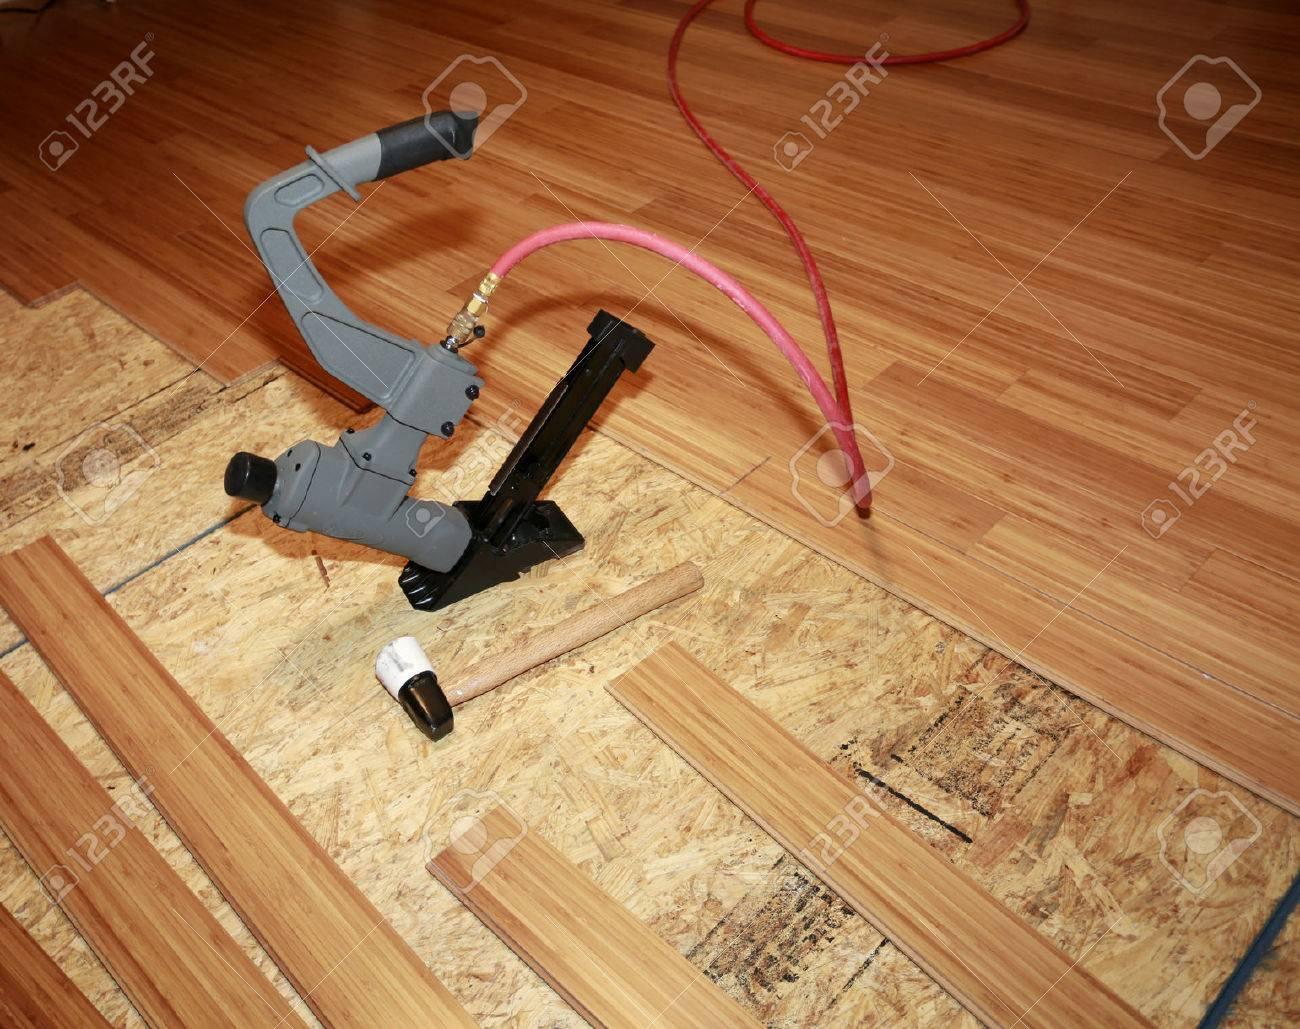 Installing hard-wood flooring - 44287723